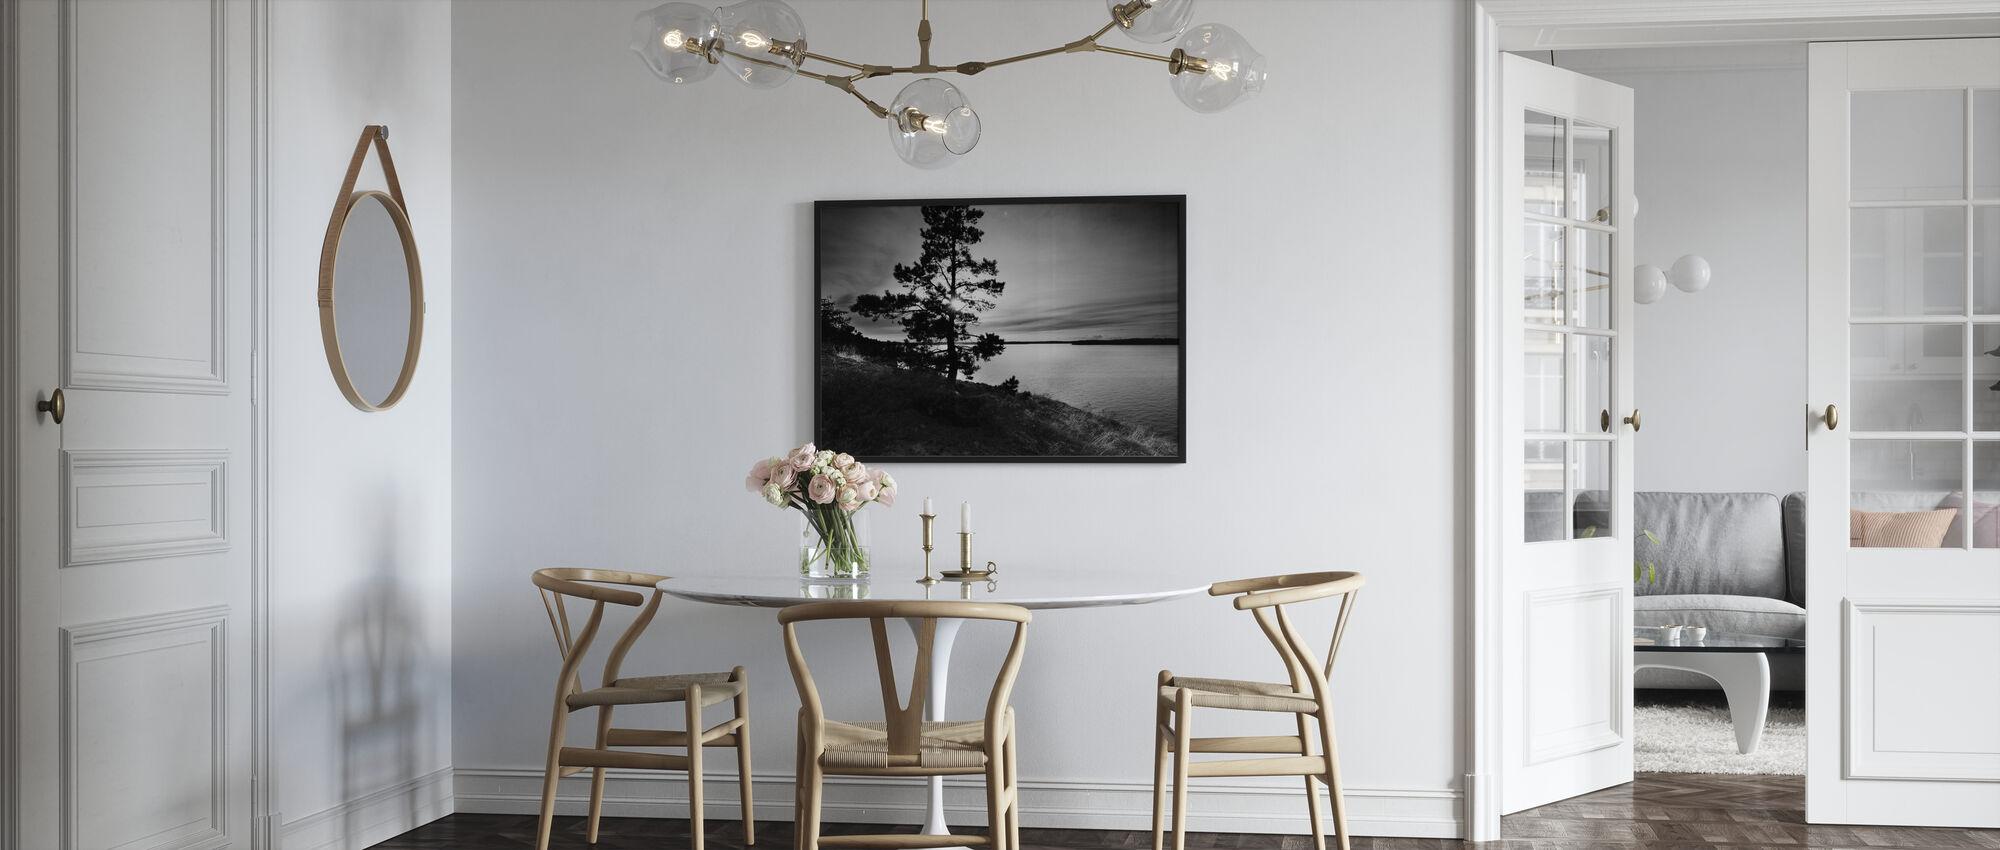 Smådalarö, Sweden, Europe - Inramad tavla - Kök